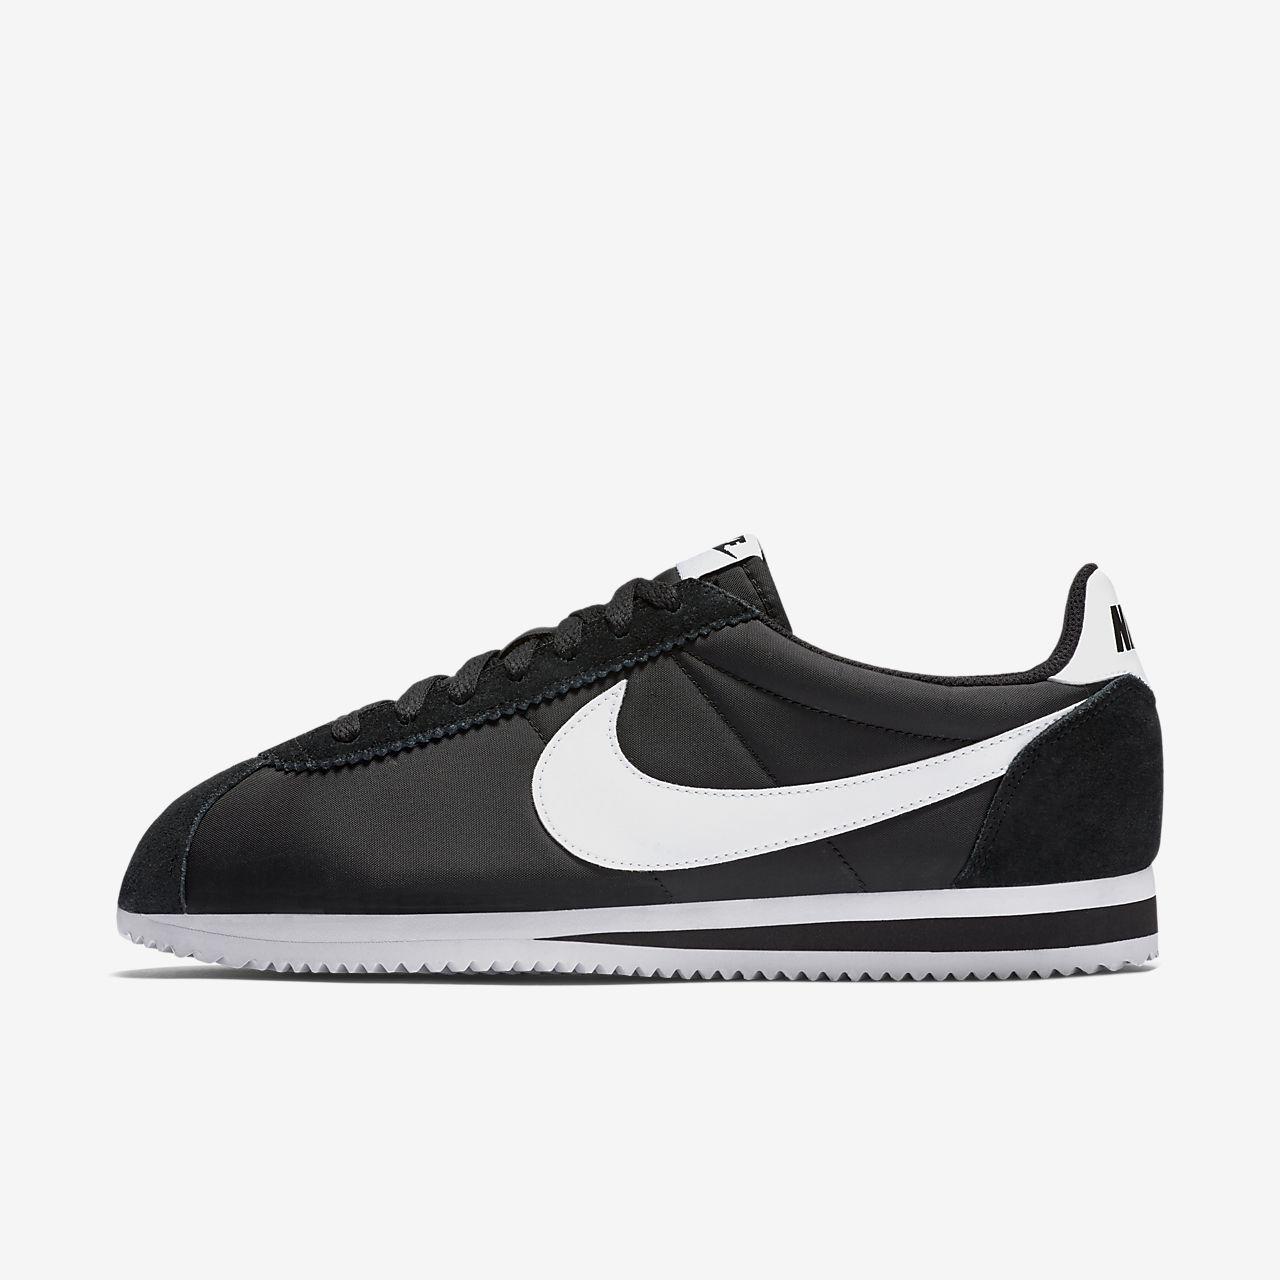 for whole family latest fashion 100% high quality Nike Classic Cortez Nylon Unisex-Schuh